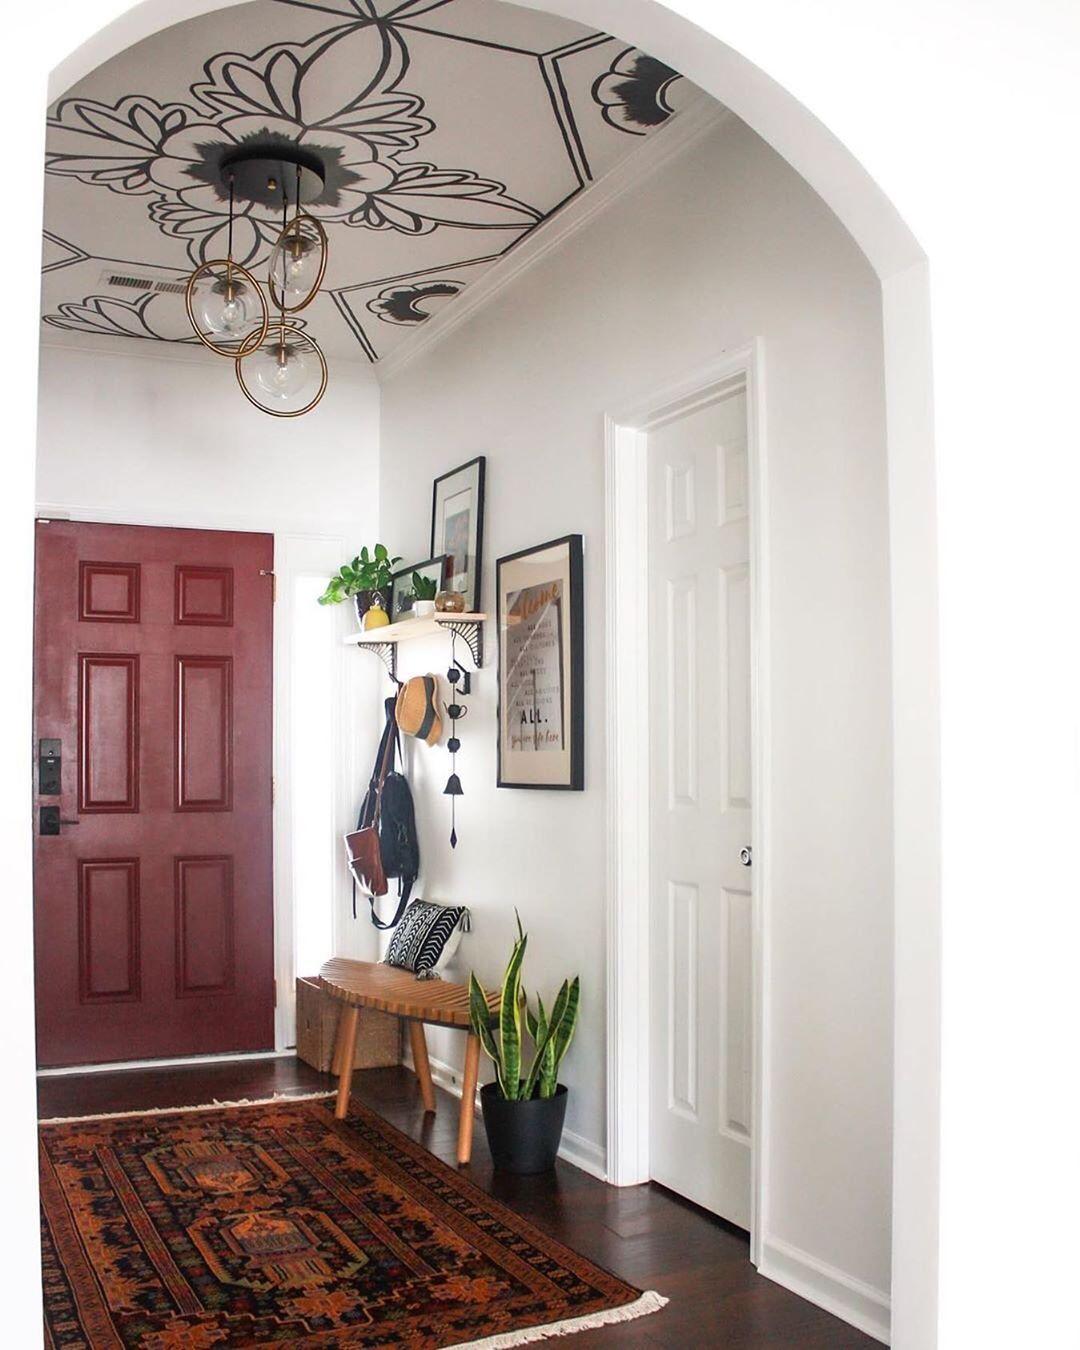 rug in living room (8)